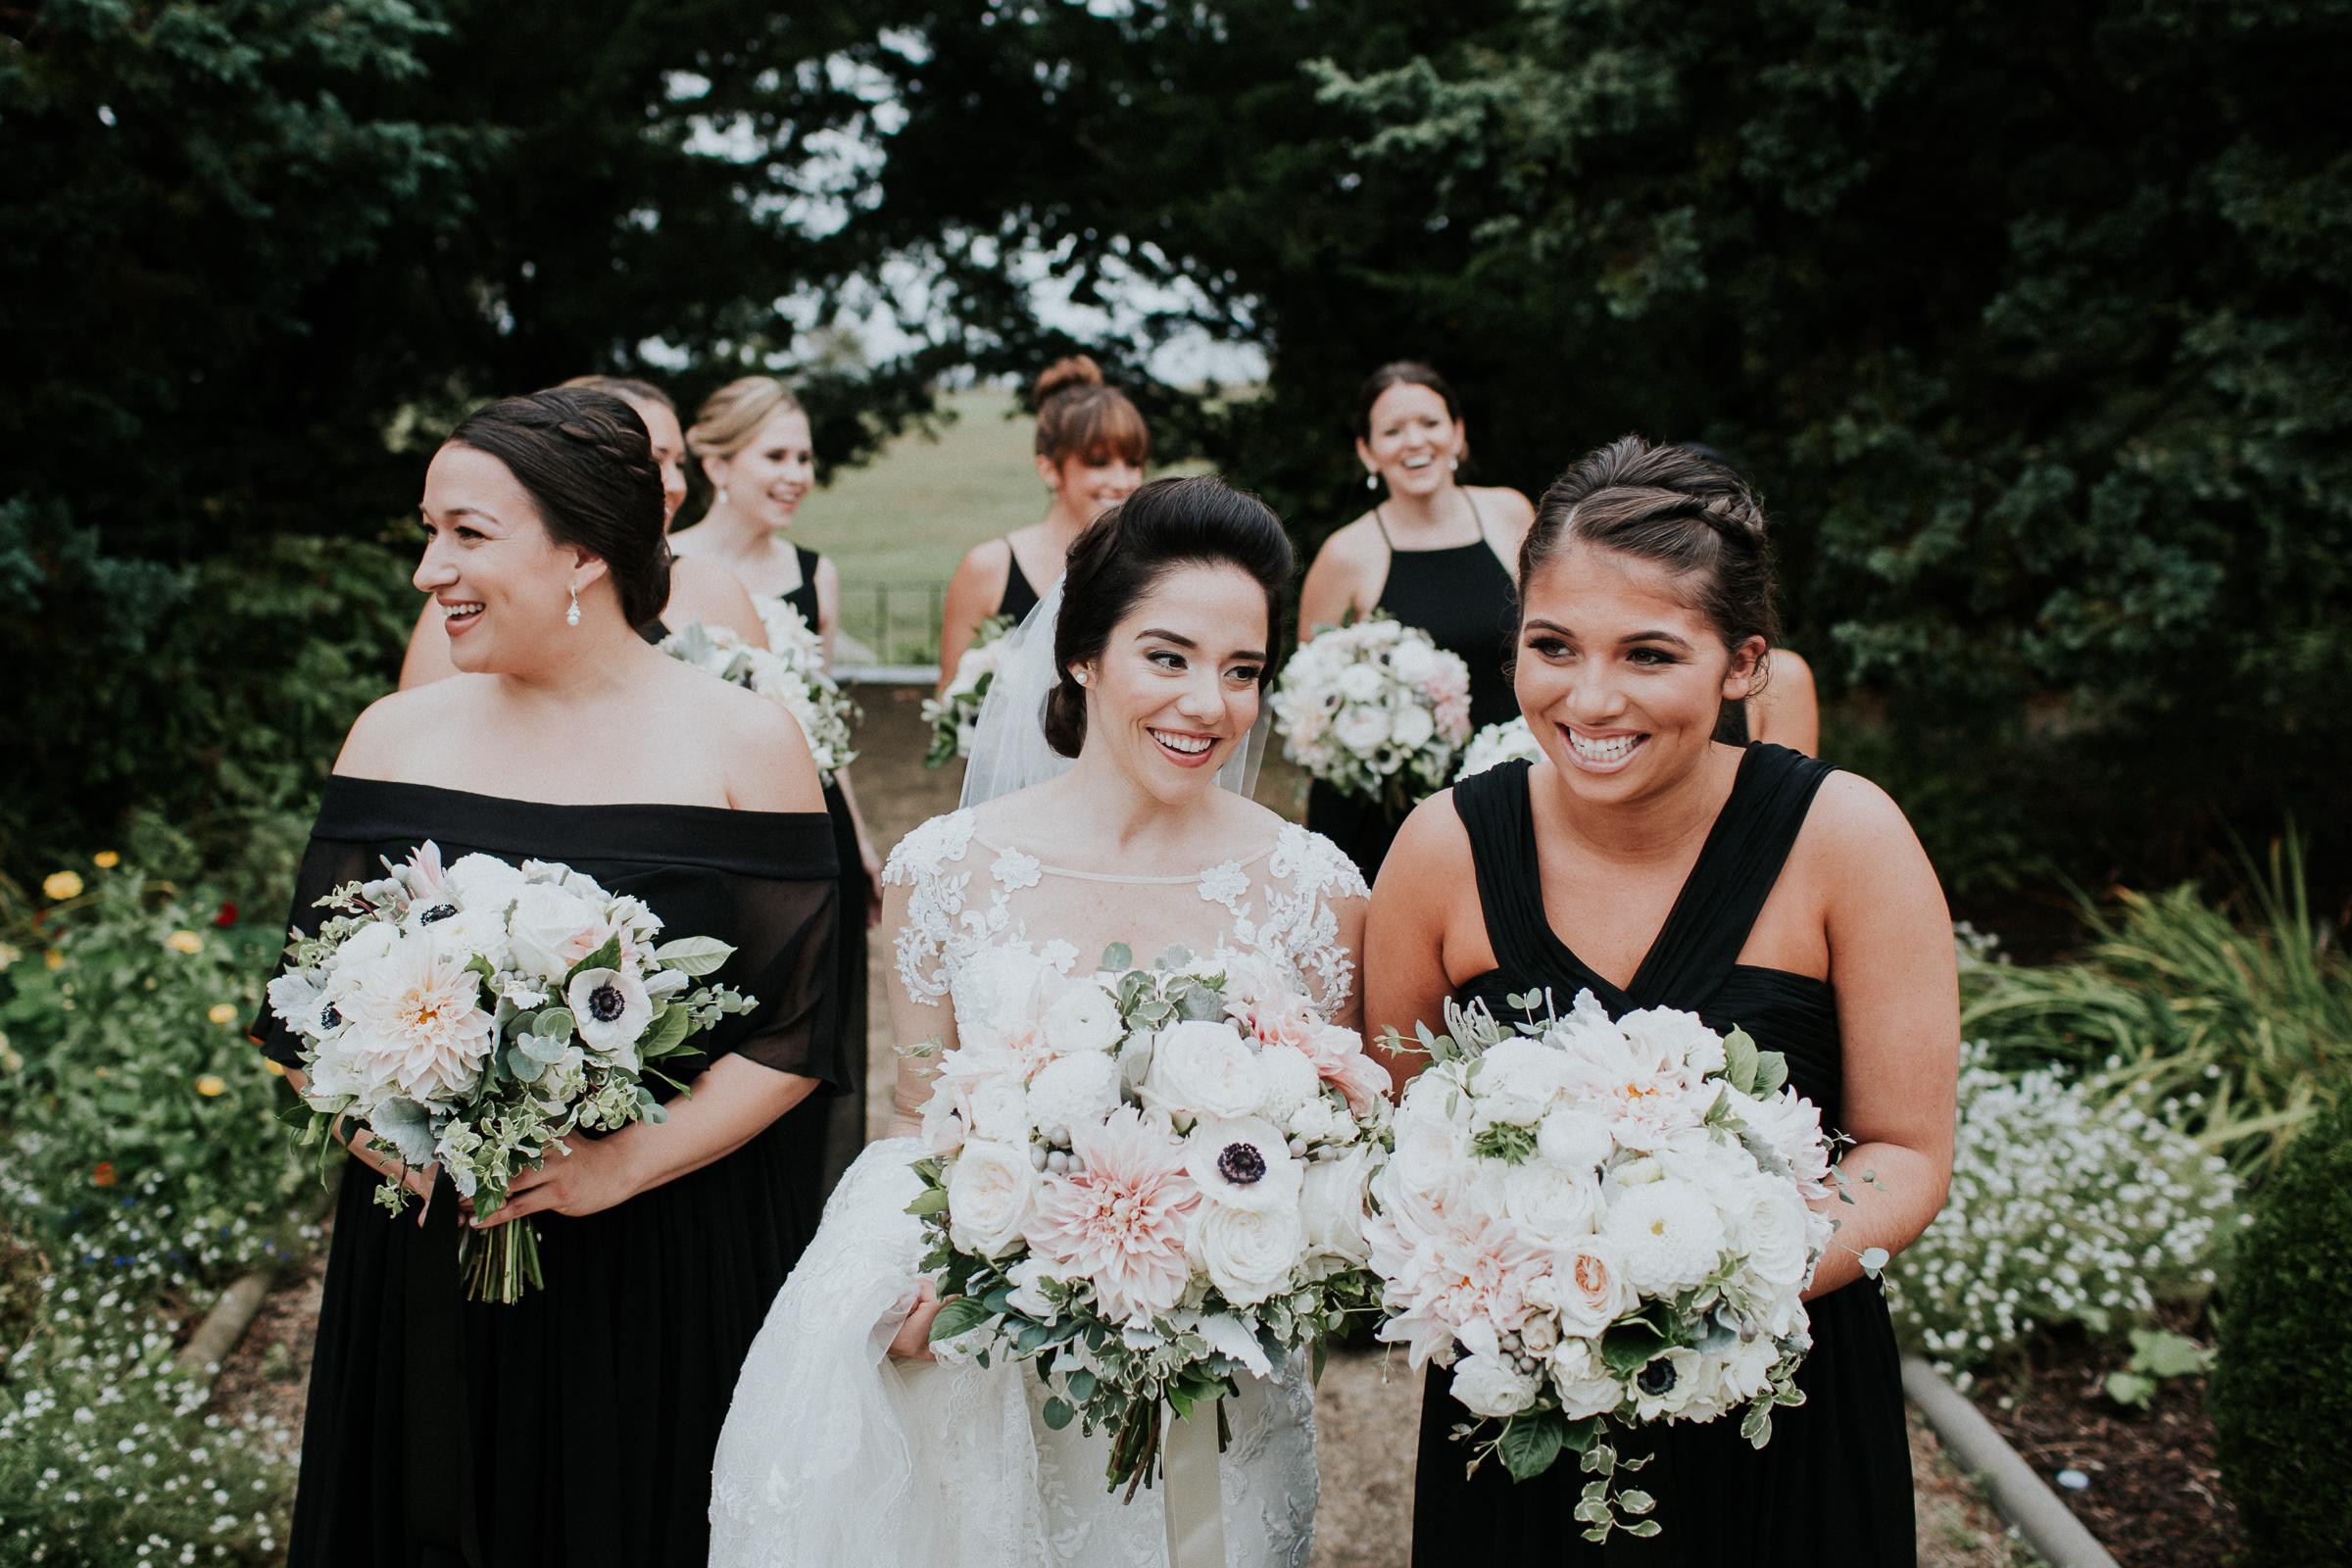 New-York-Documentary-Wedding-Photography-Best-Of-2017-by-Elvira-Kalviste-Photography-103.jpg